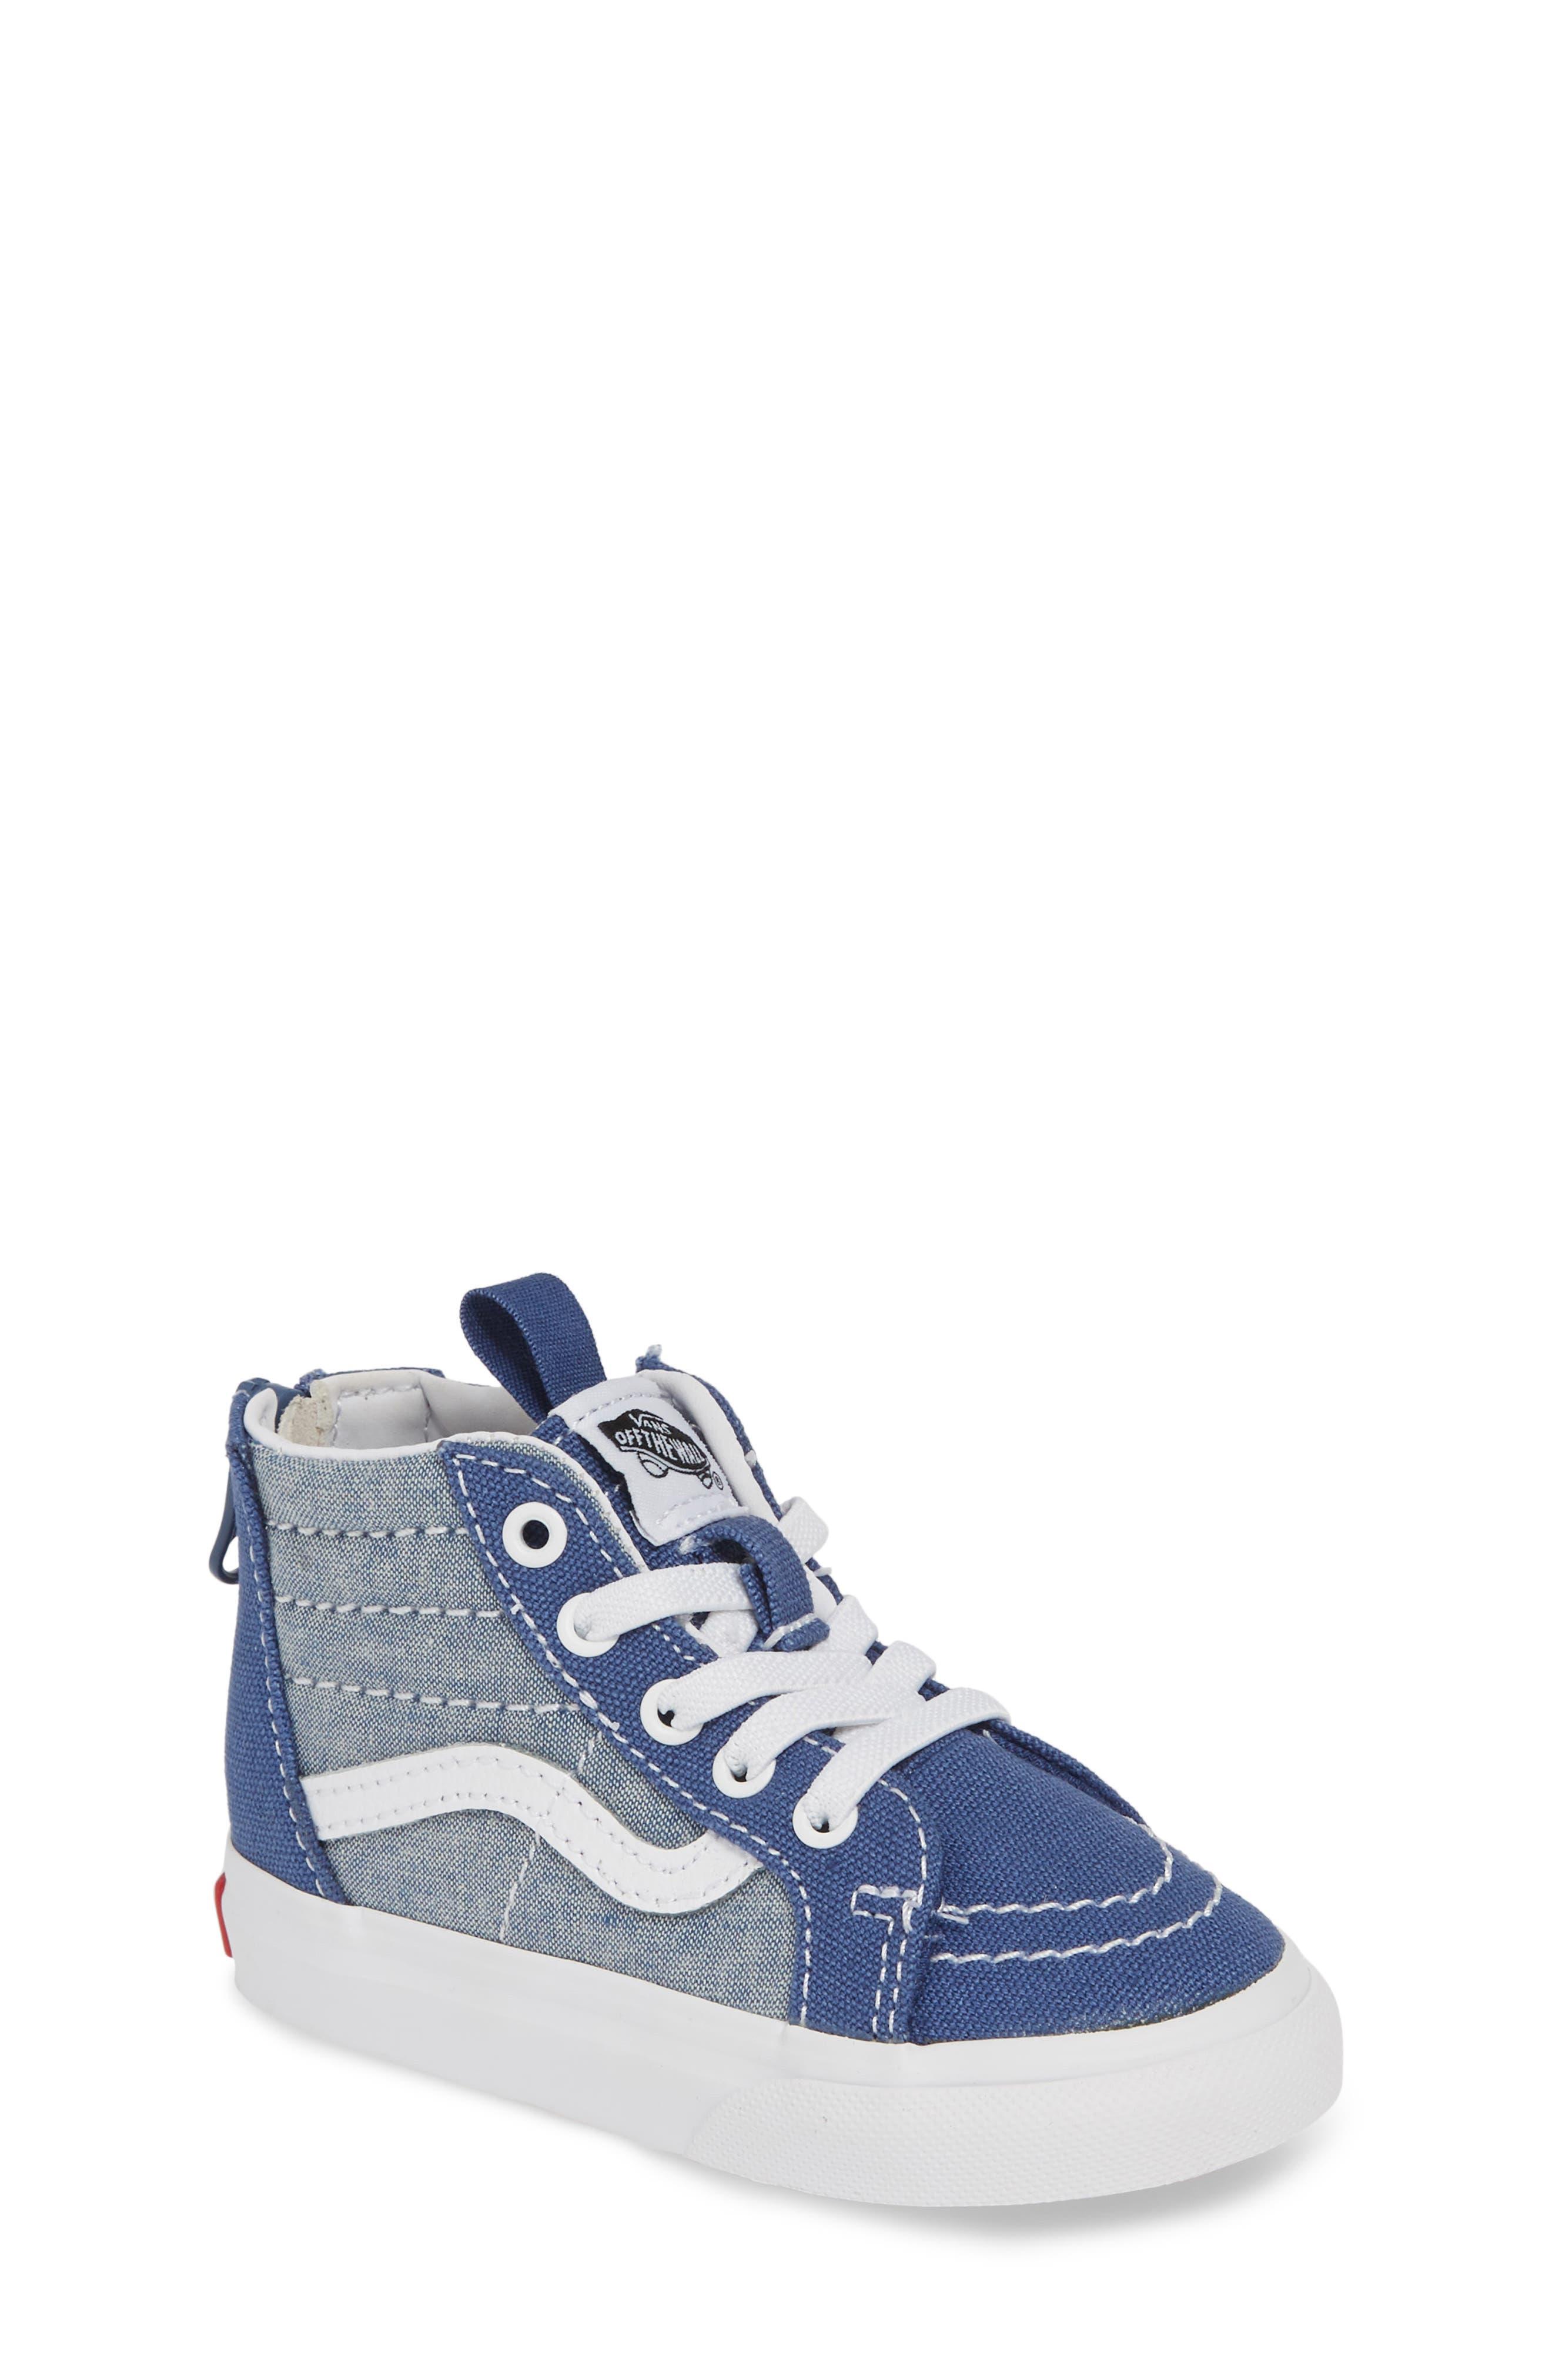 VANS 'Sk8-Hi' Sneaker, Main, color, CHAMBRAY CANVAS NAVY/ WHITE